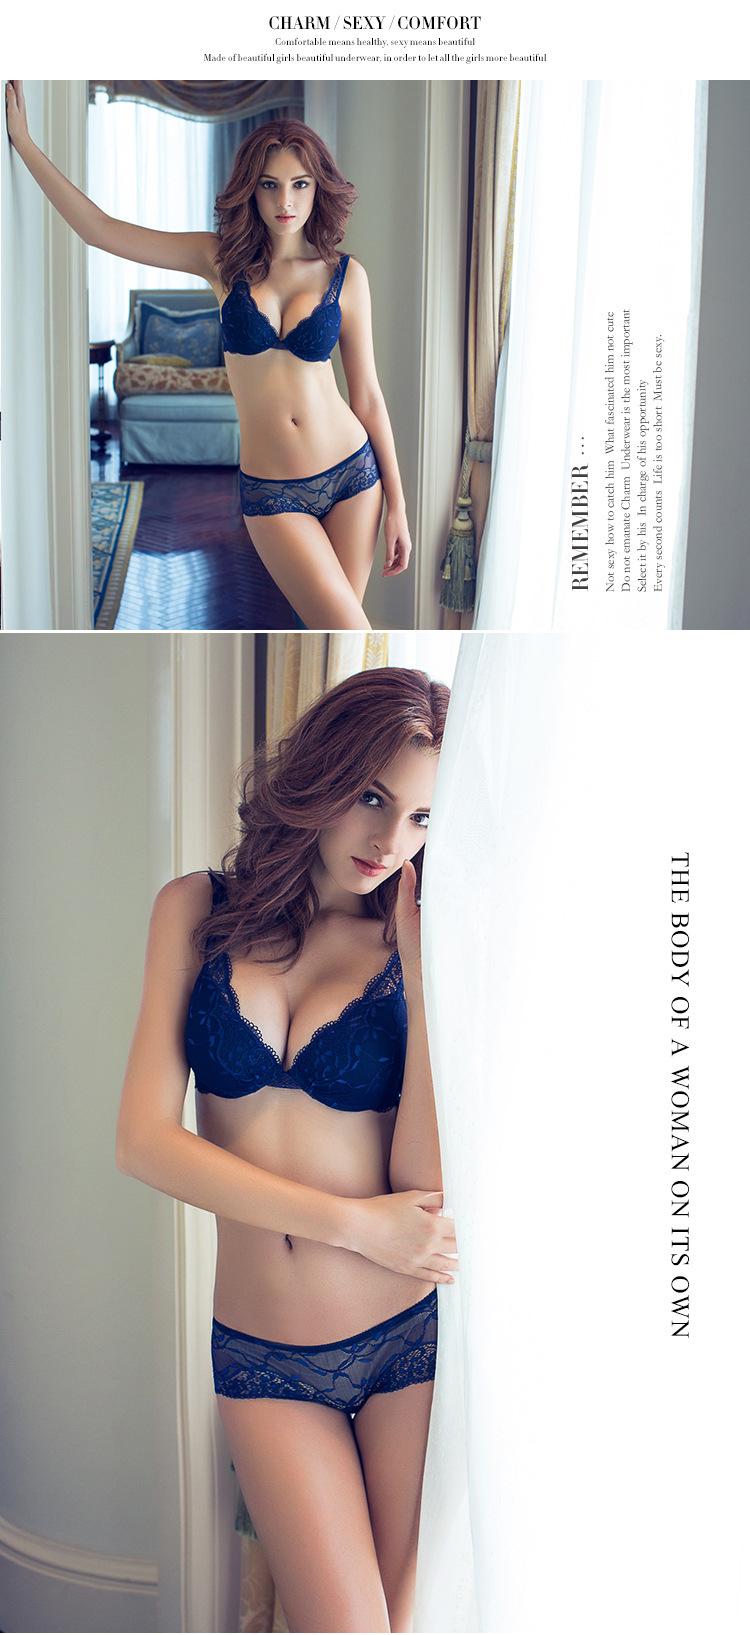 17 Women underwear bra suit Push Up Bra Set Sexy Deep v gather adjustment female lingerie Lace Bra and pants sets 75 B C Cup 2